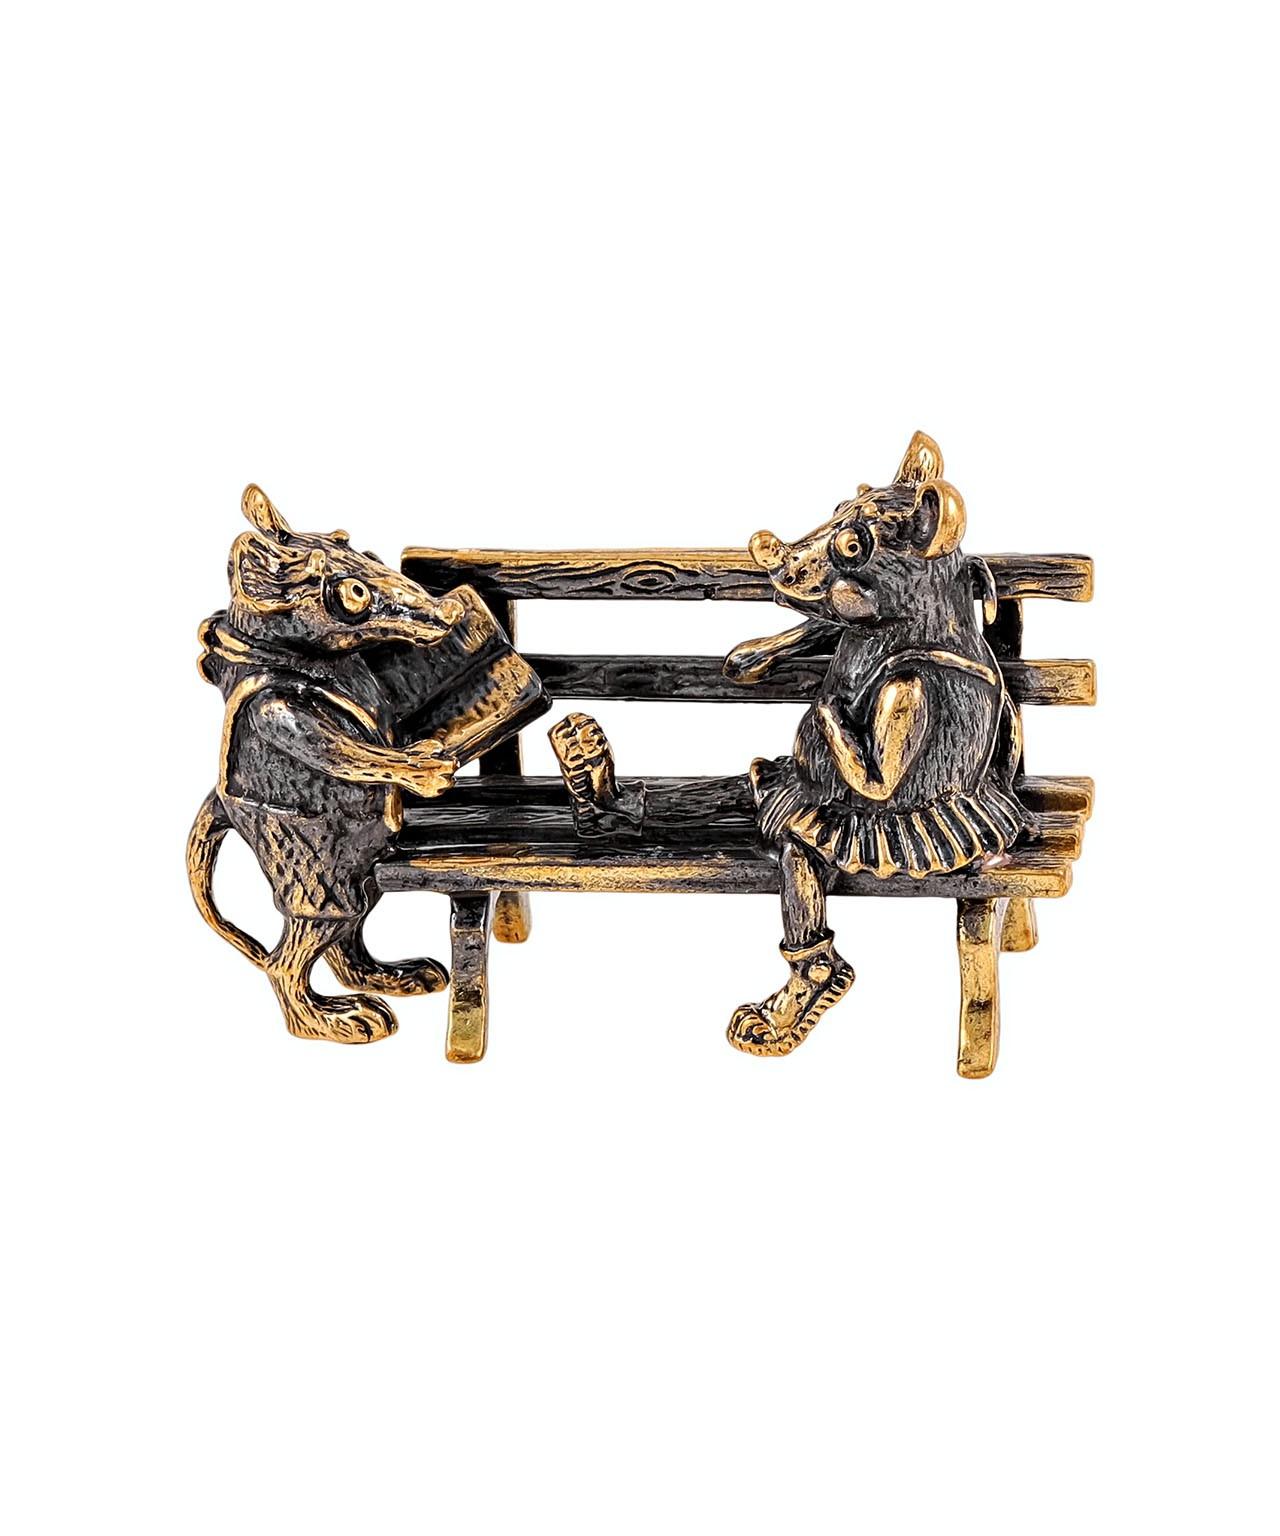 Мышки на скамейки поэзия без подставки 1731.1